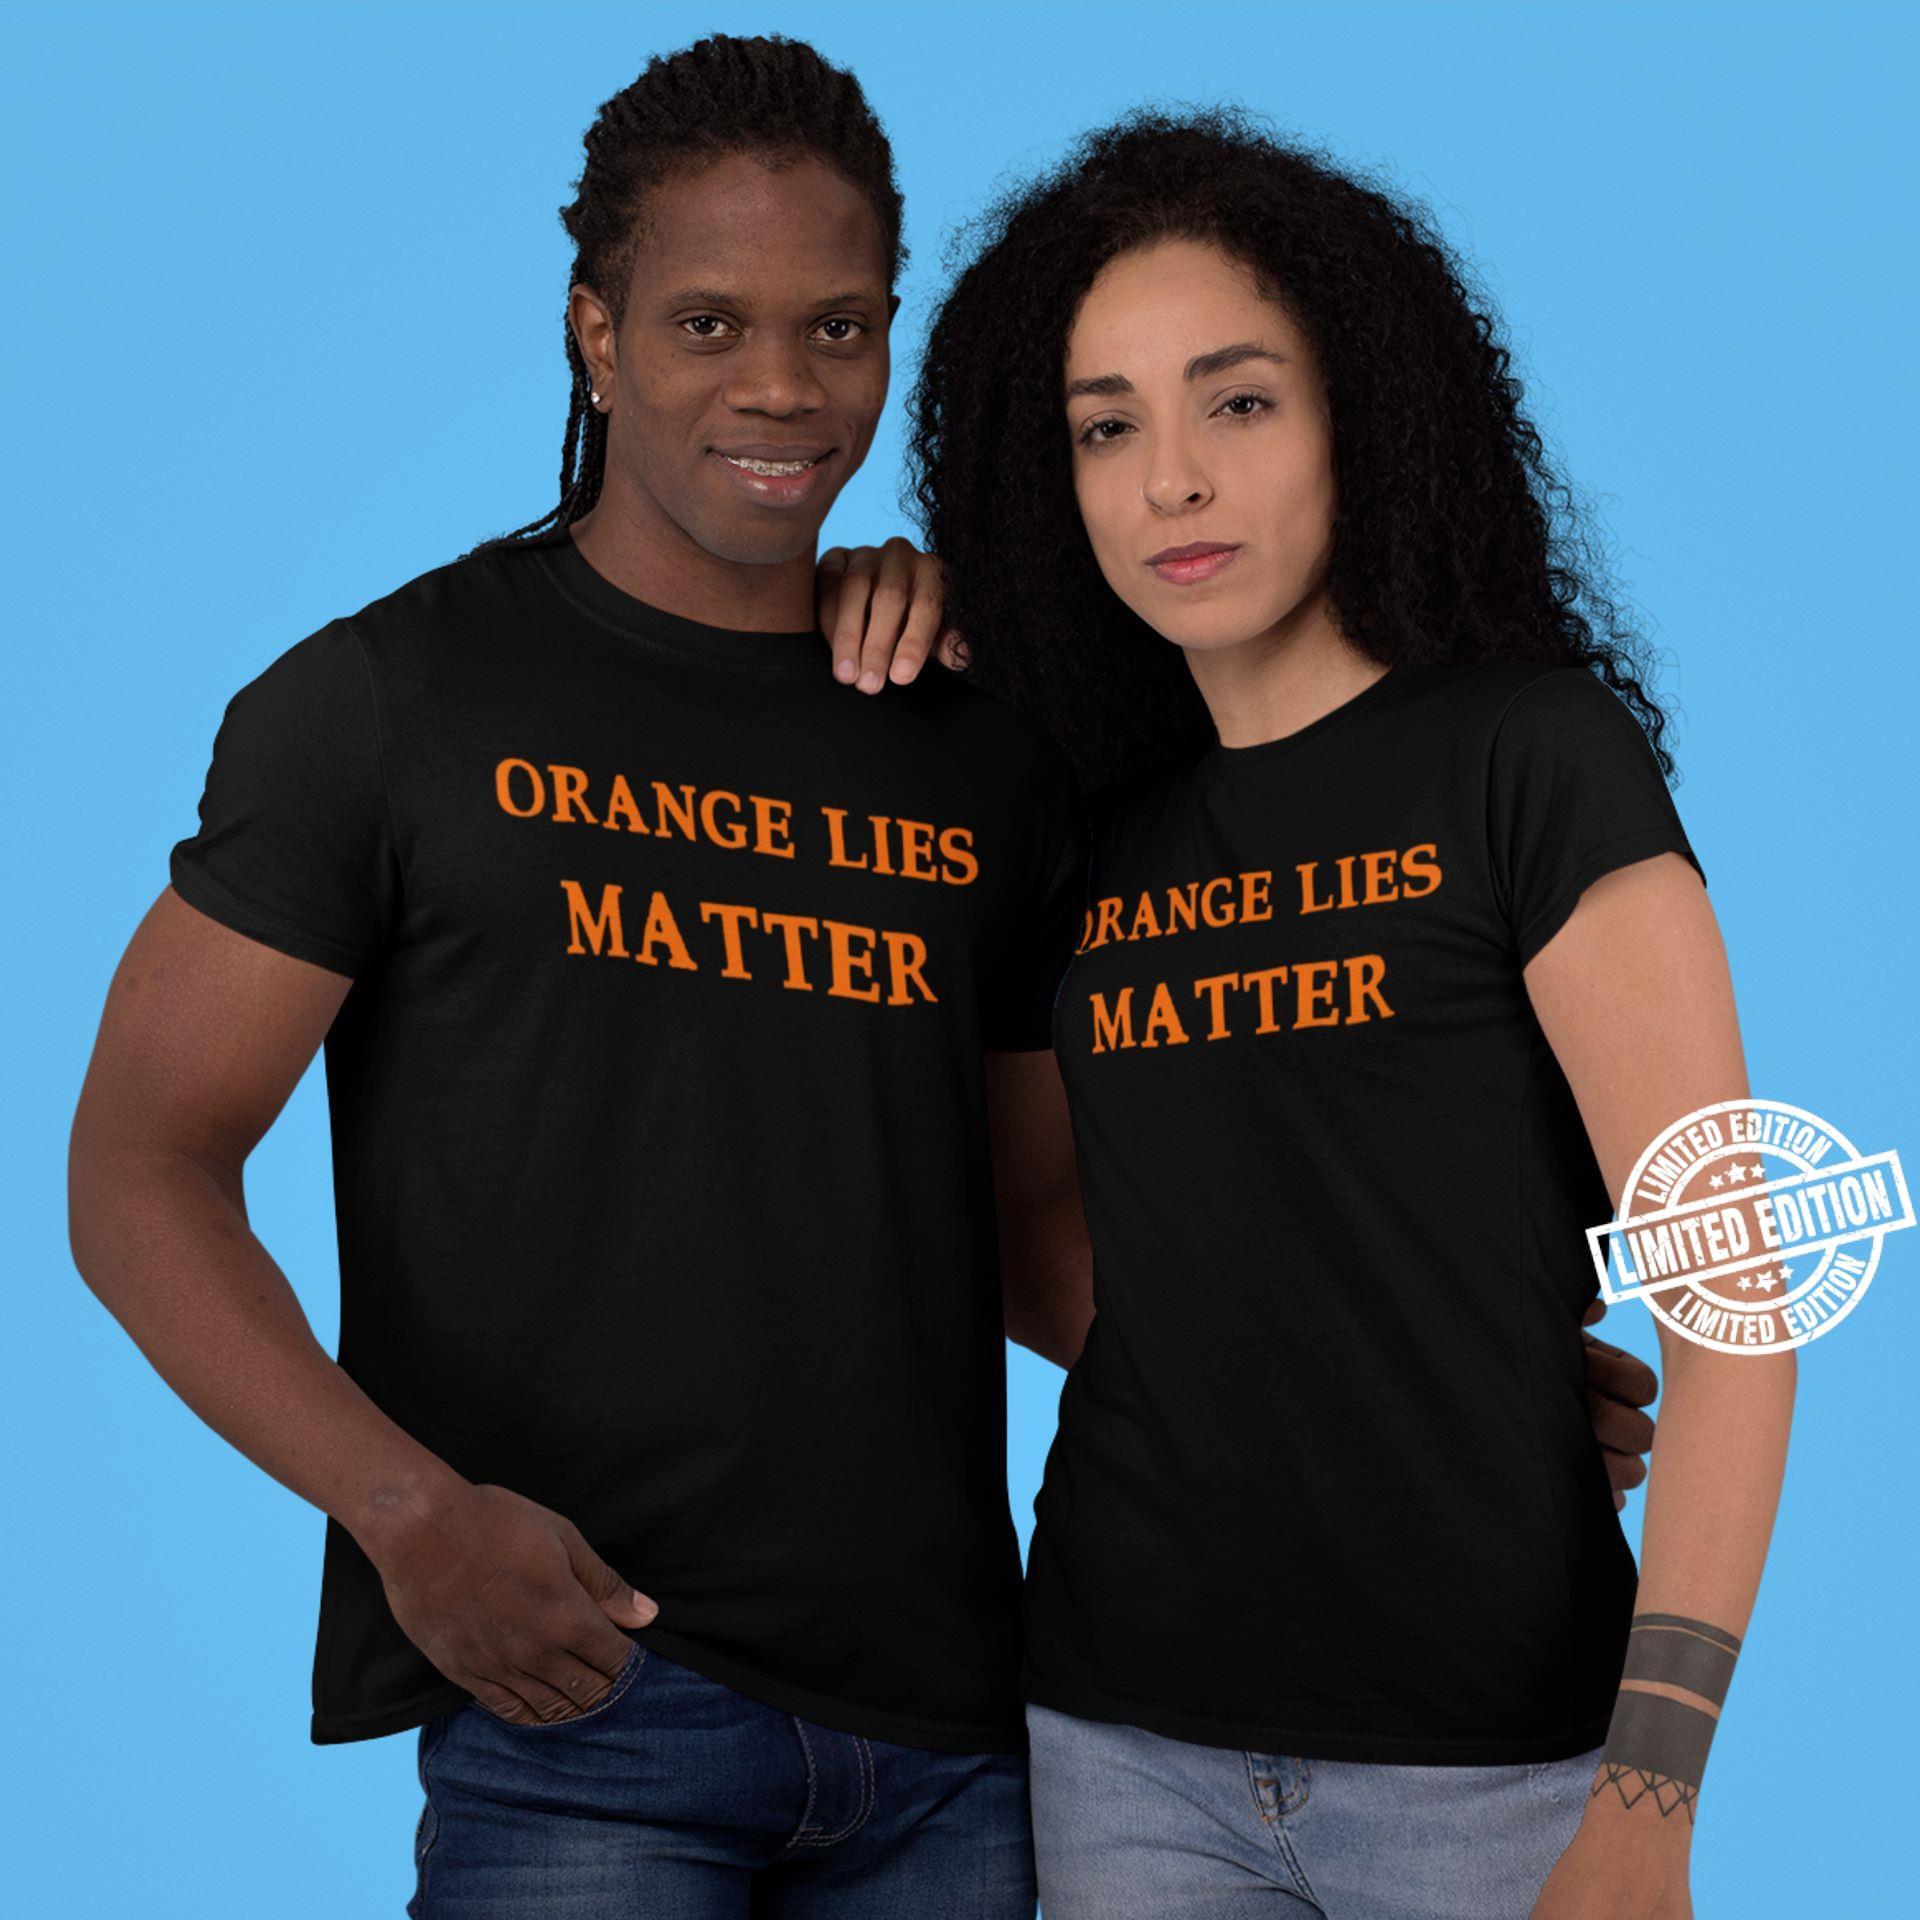 Orange lies matter shirt